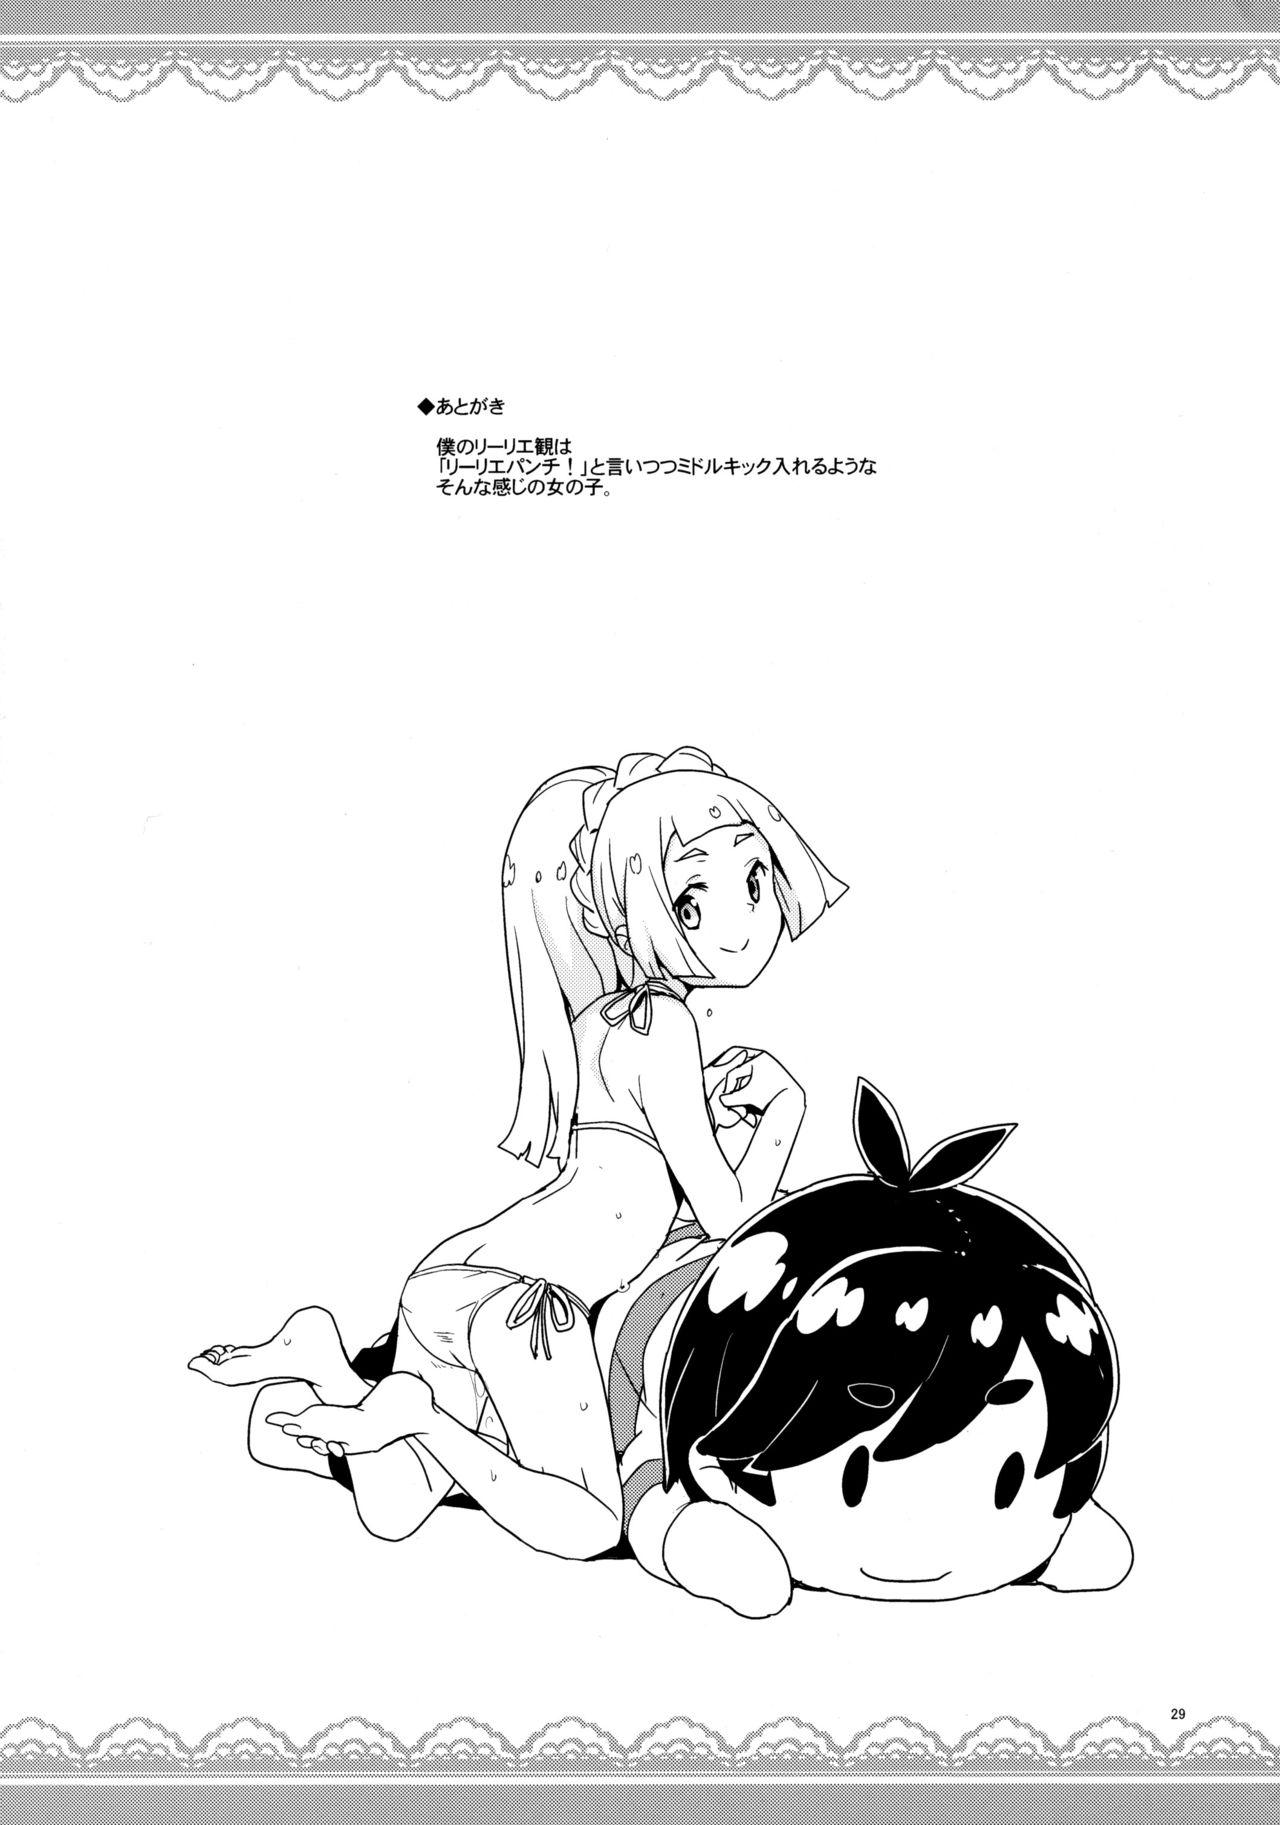 Lillie to Sun no Saimin Daisakusen - Lillie and Sun's Hypnotized Campaign 28